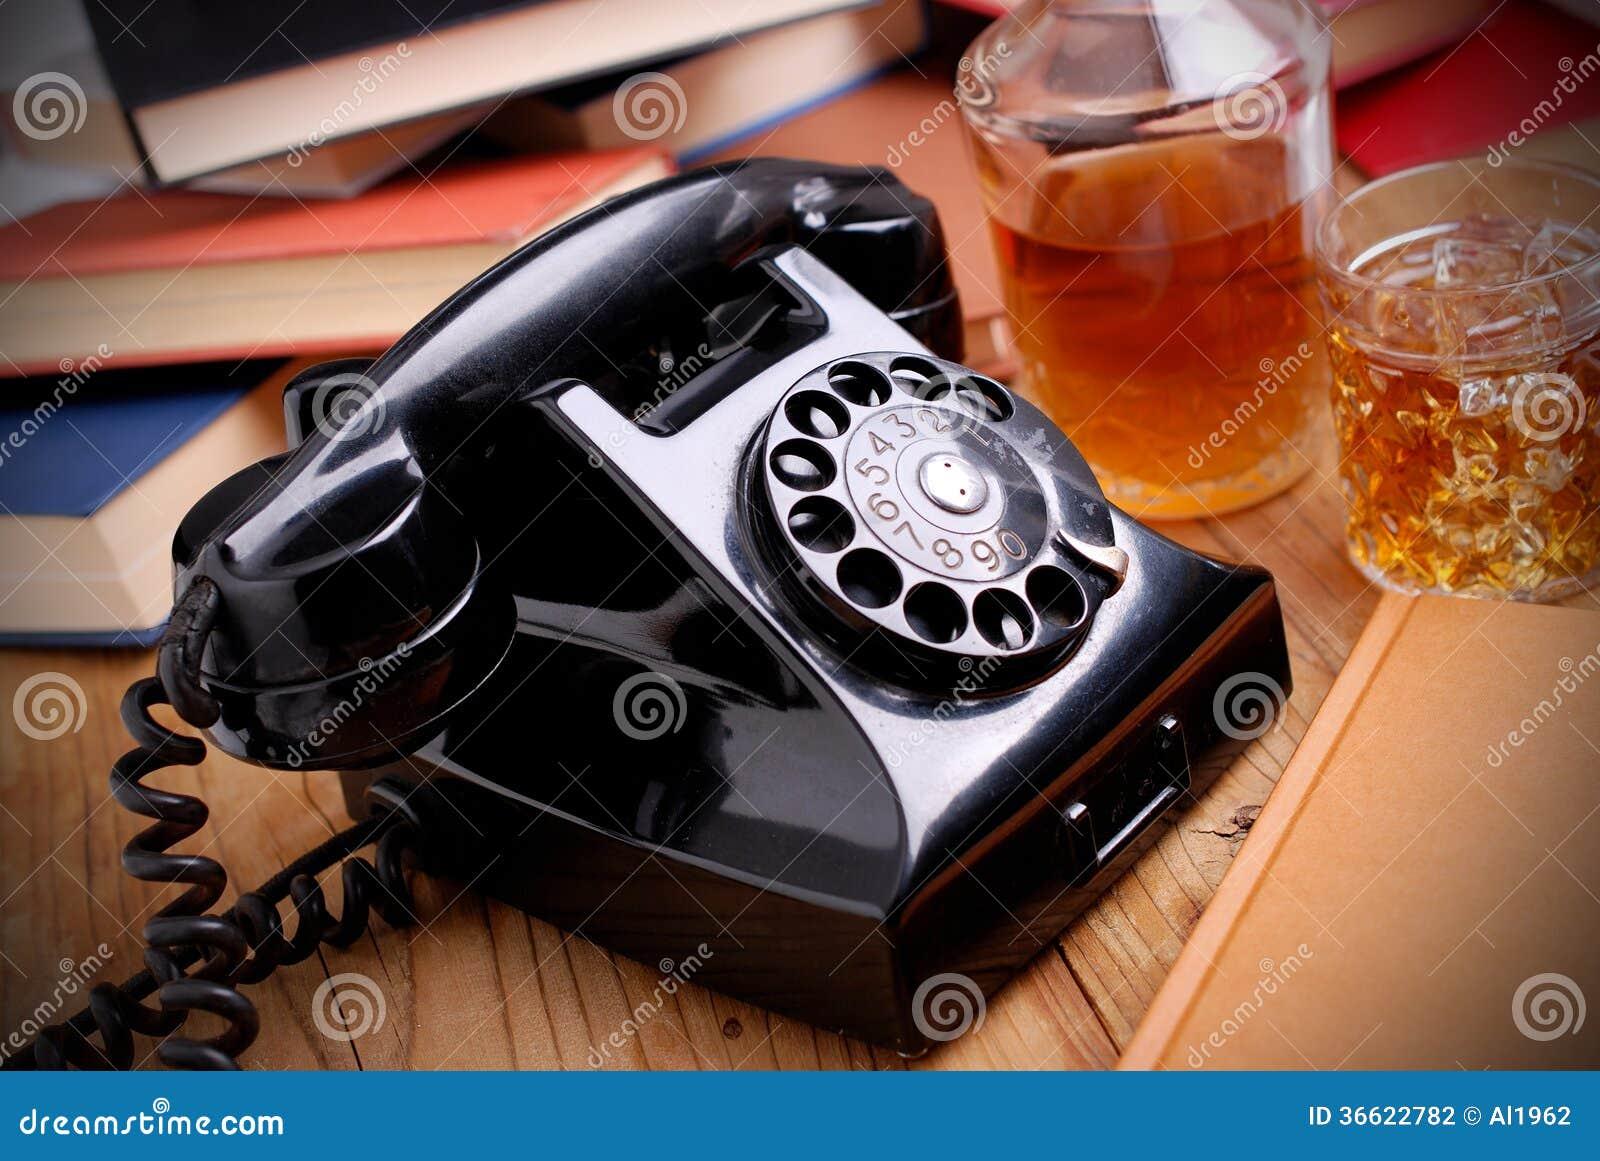 Svart retro telefon